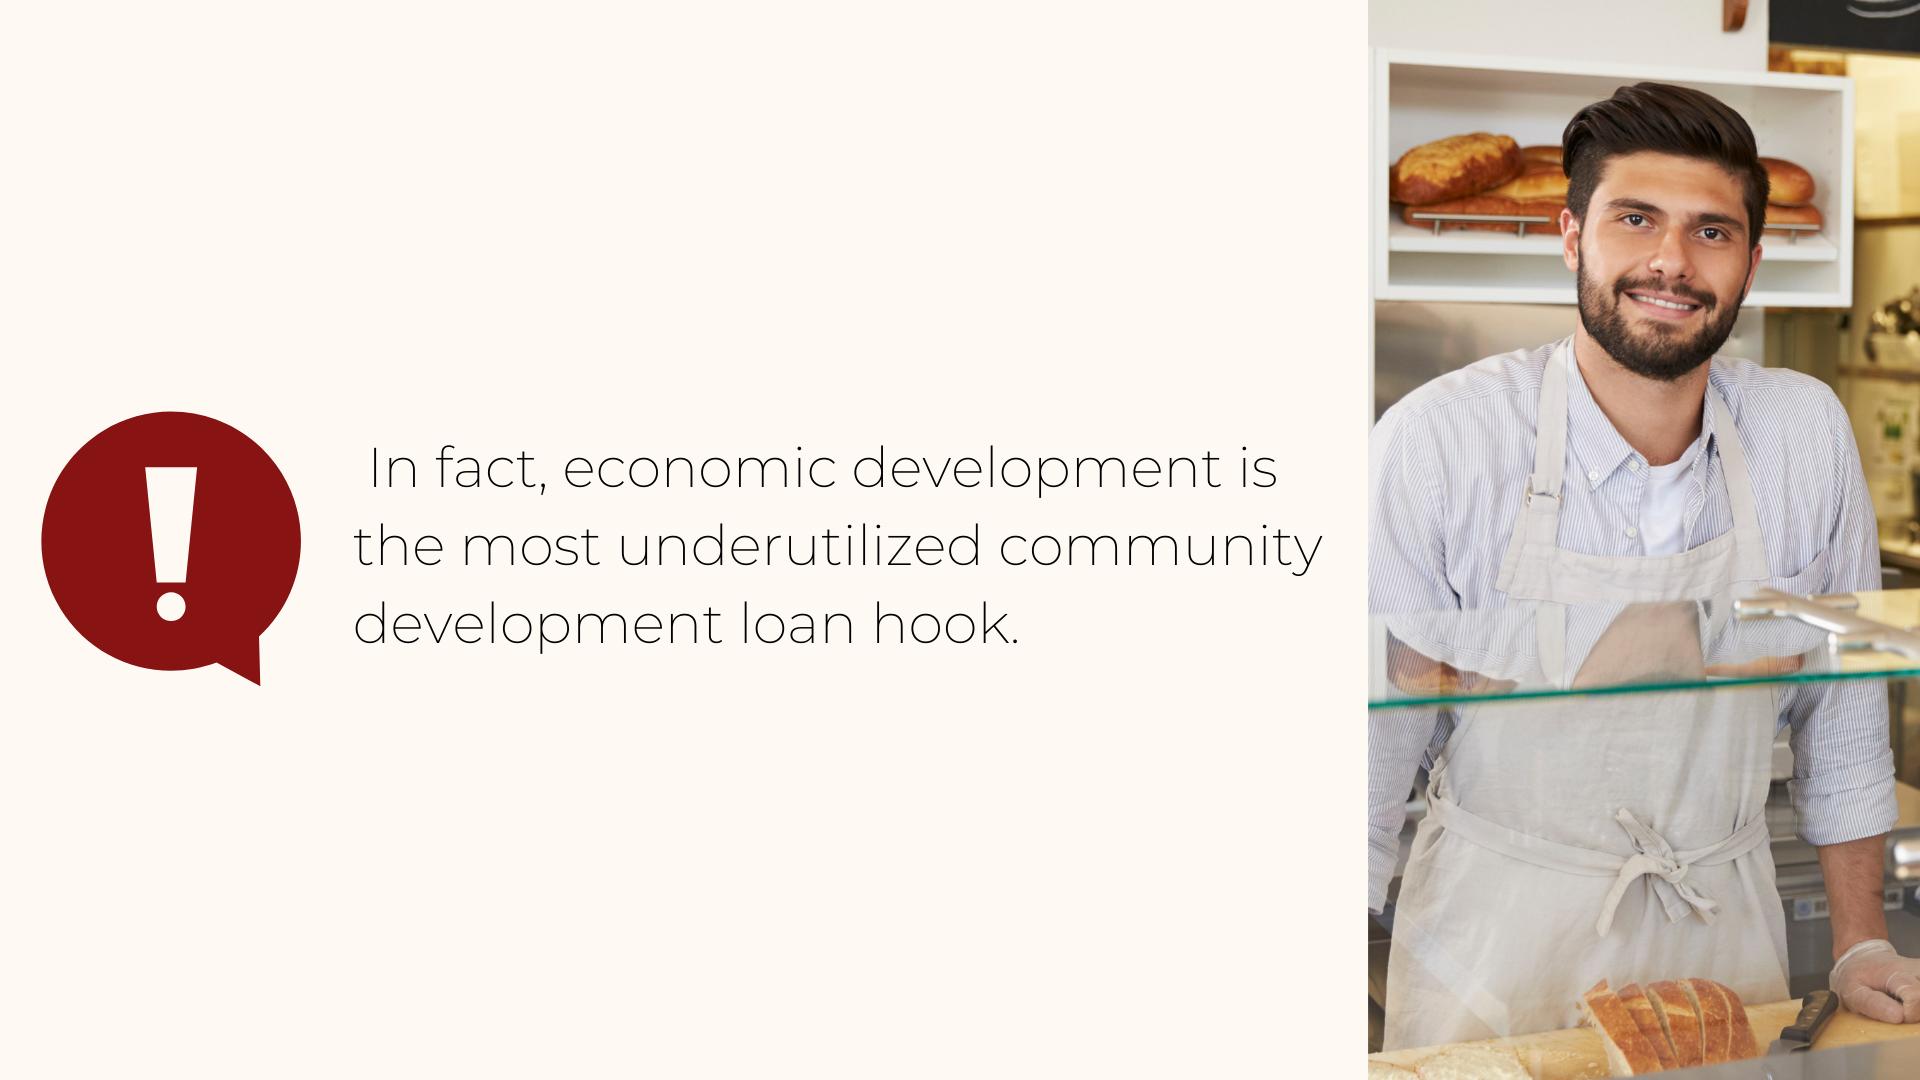 Economic Development underutilized community development loan hook